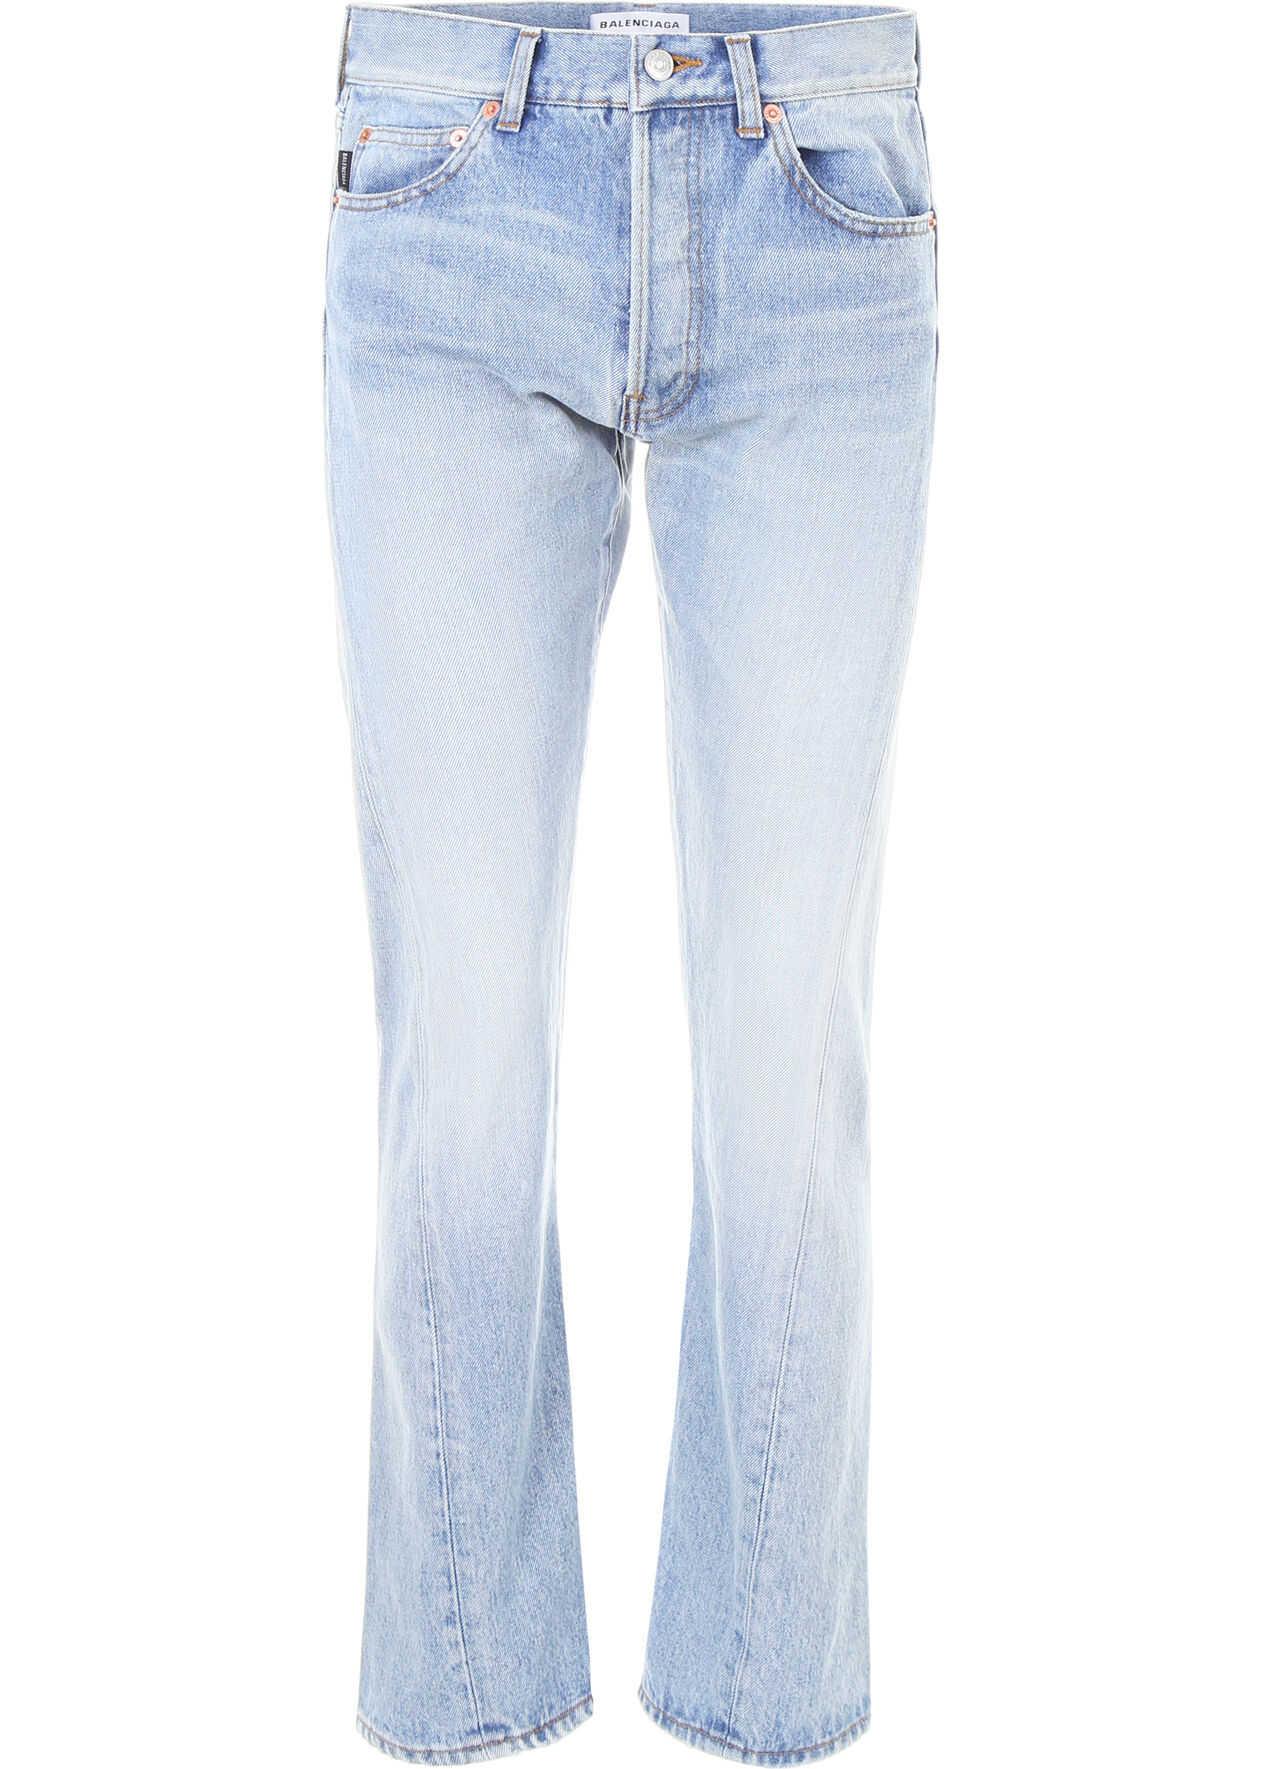 Balenciaga Twisted Leg Jeans DIRT SMOK L BLU